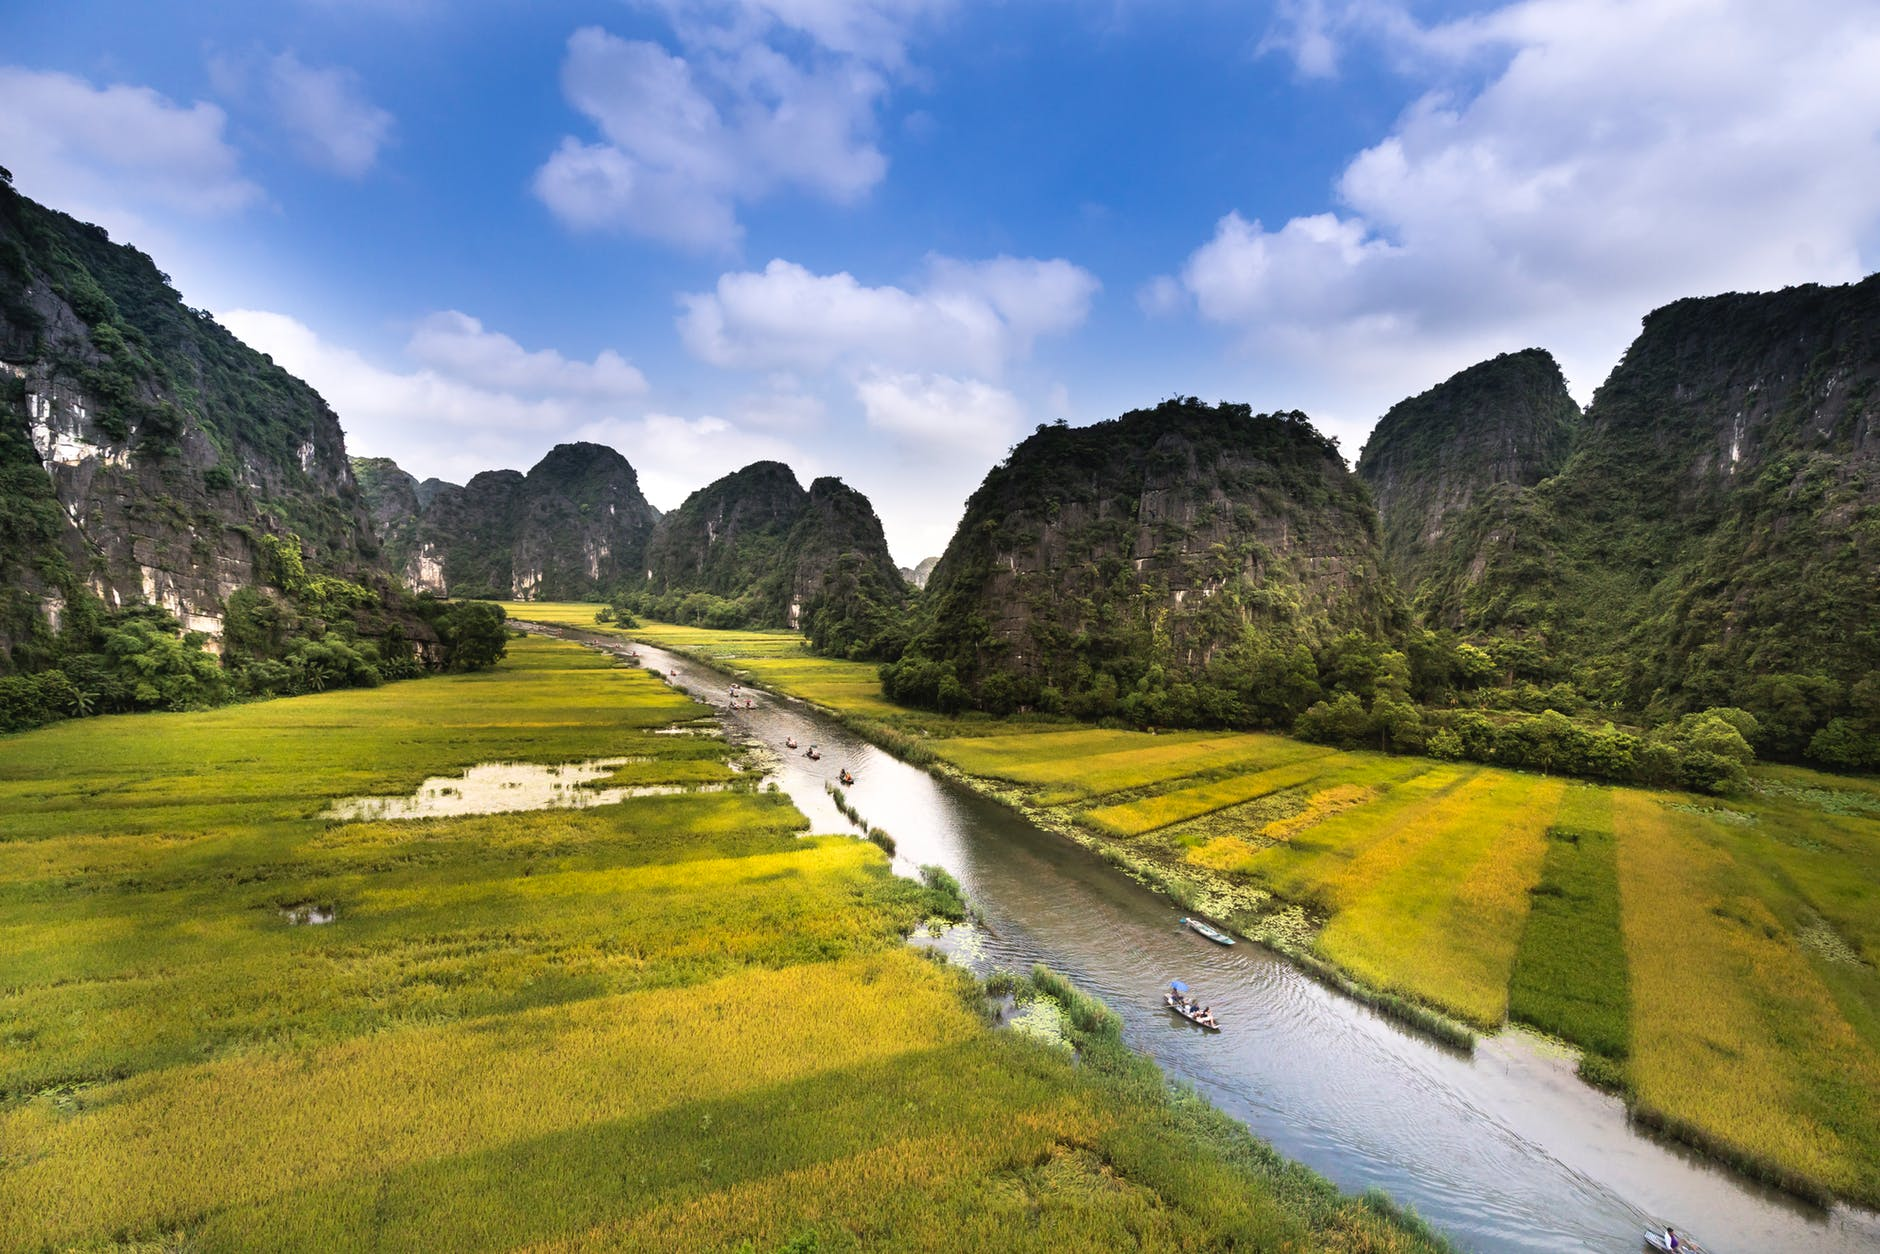 Berapa Sih Panjang Sungai NilSebenarnya?